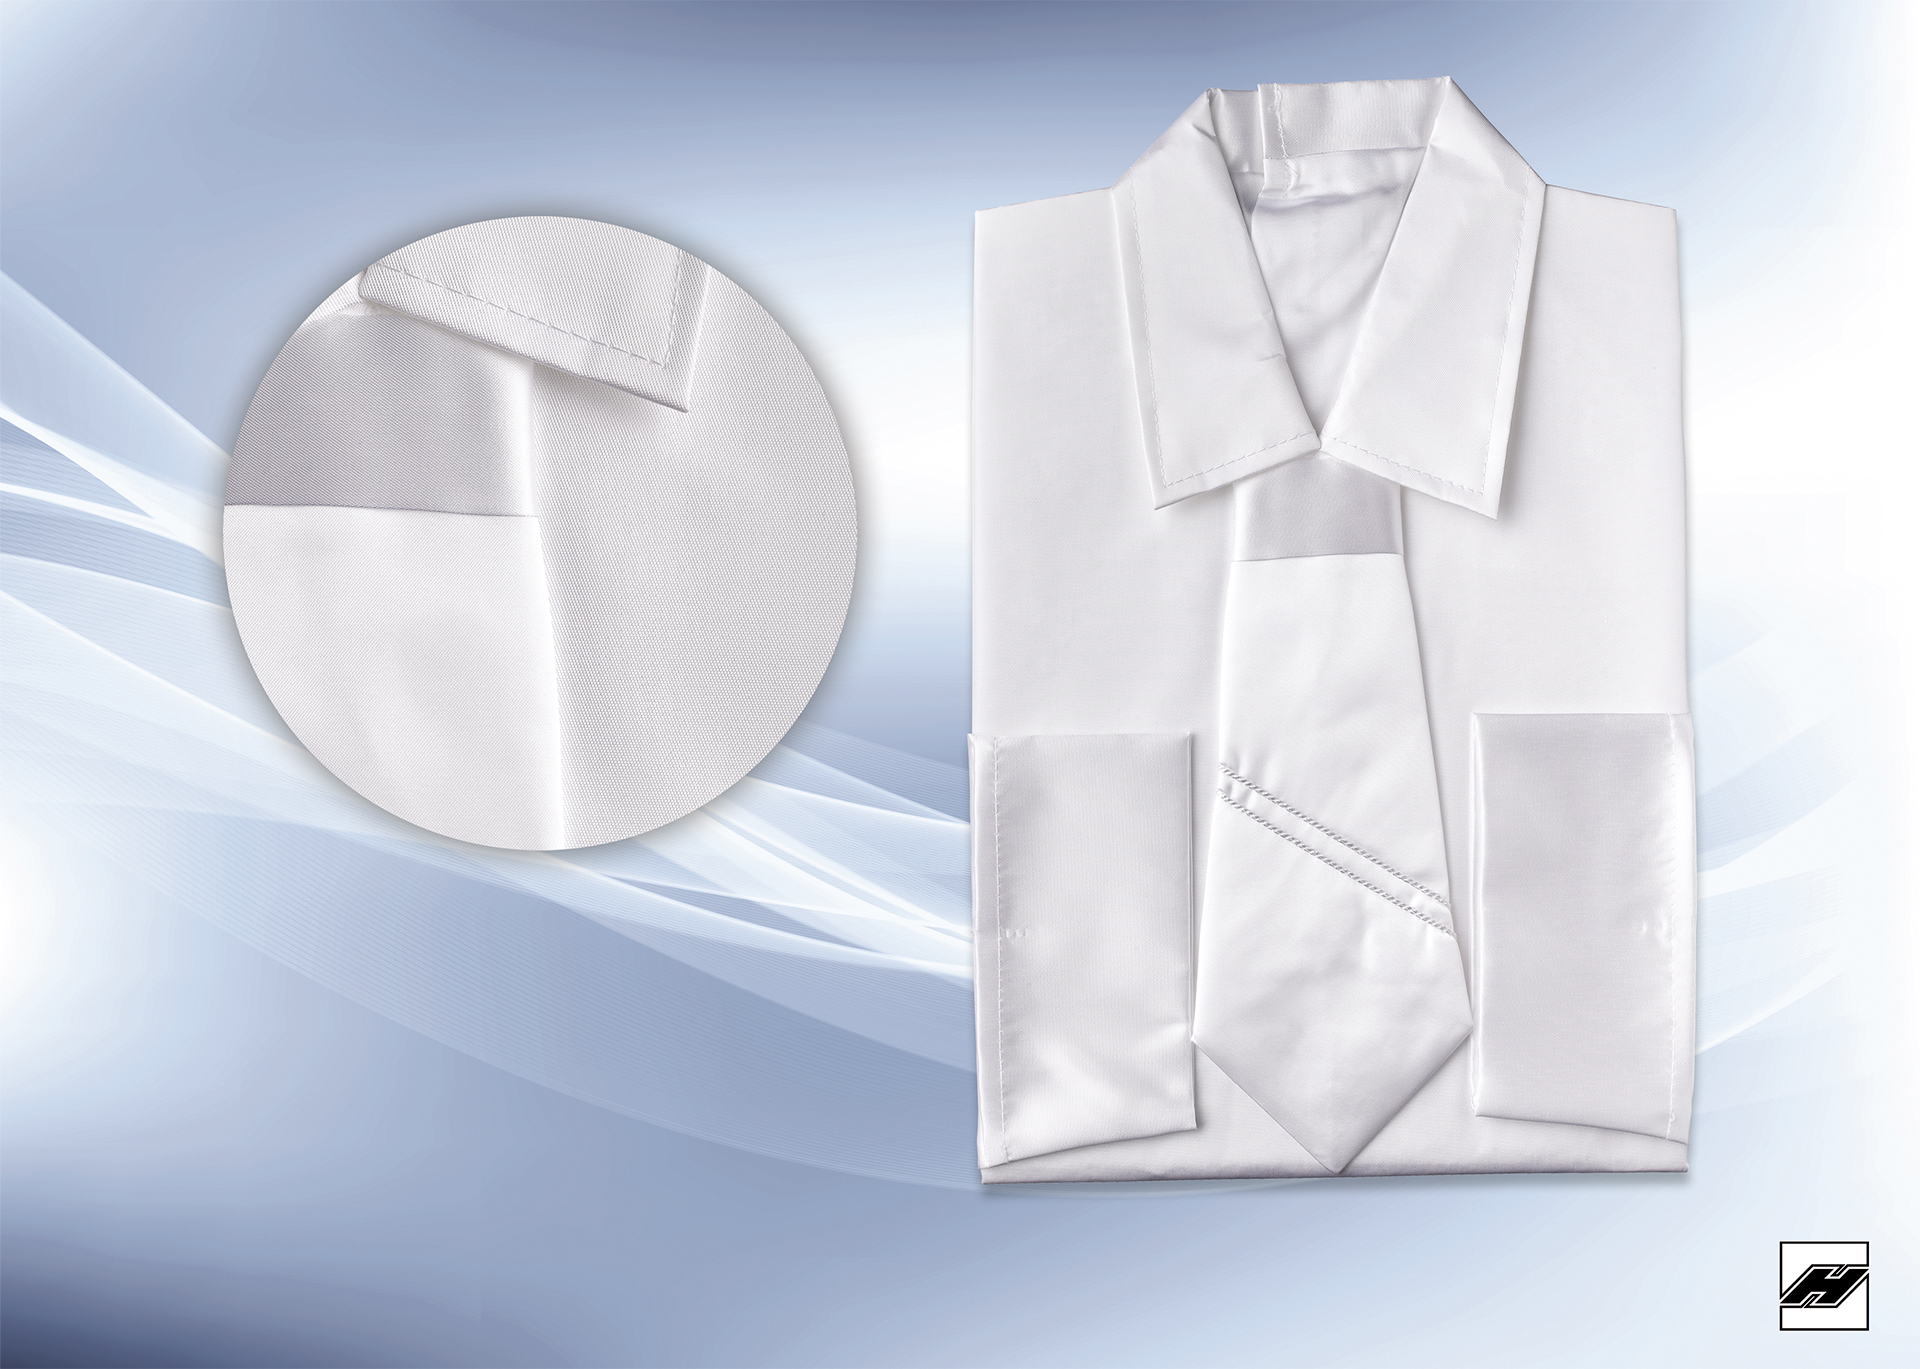 Herrenhemd 113 KS weiß, gebundener Schlips